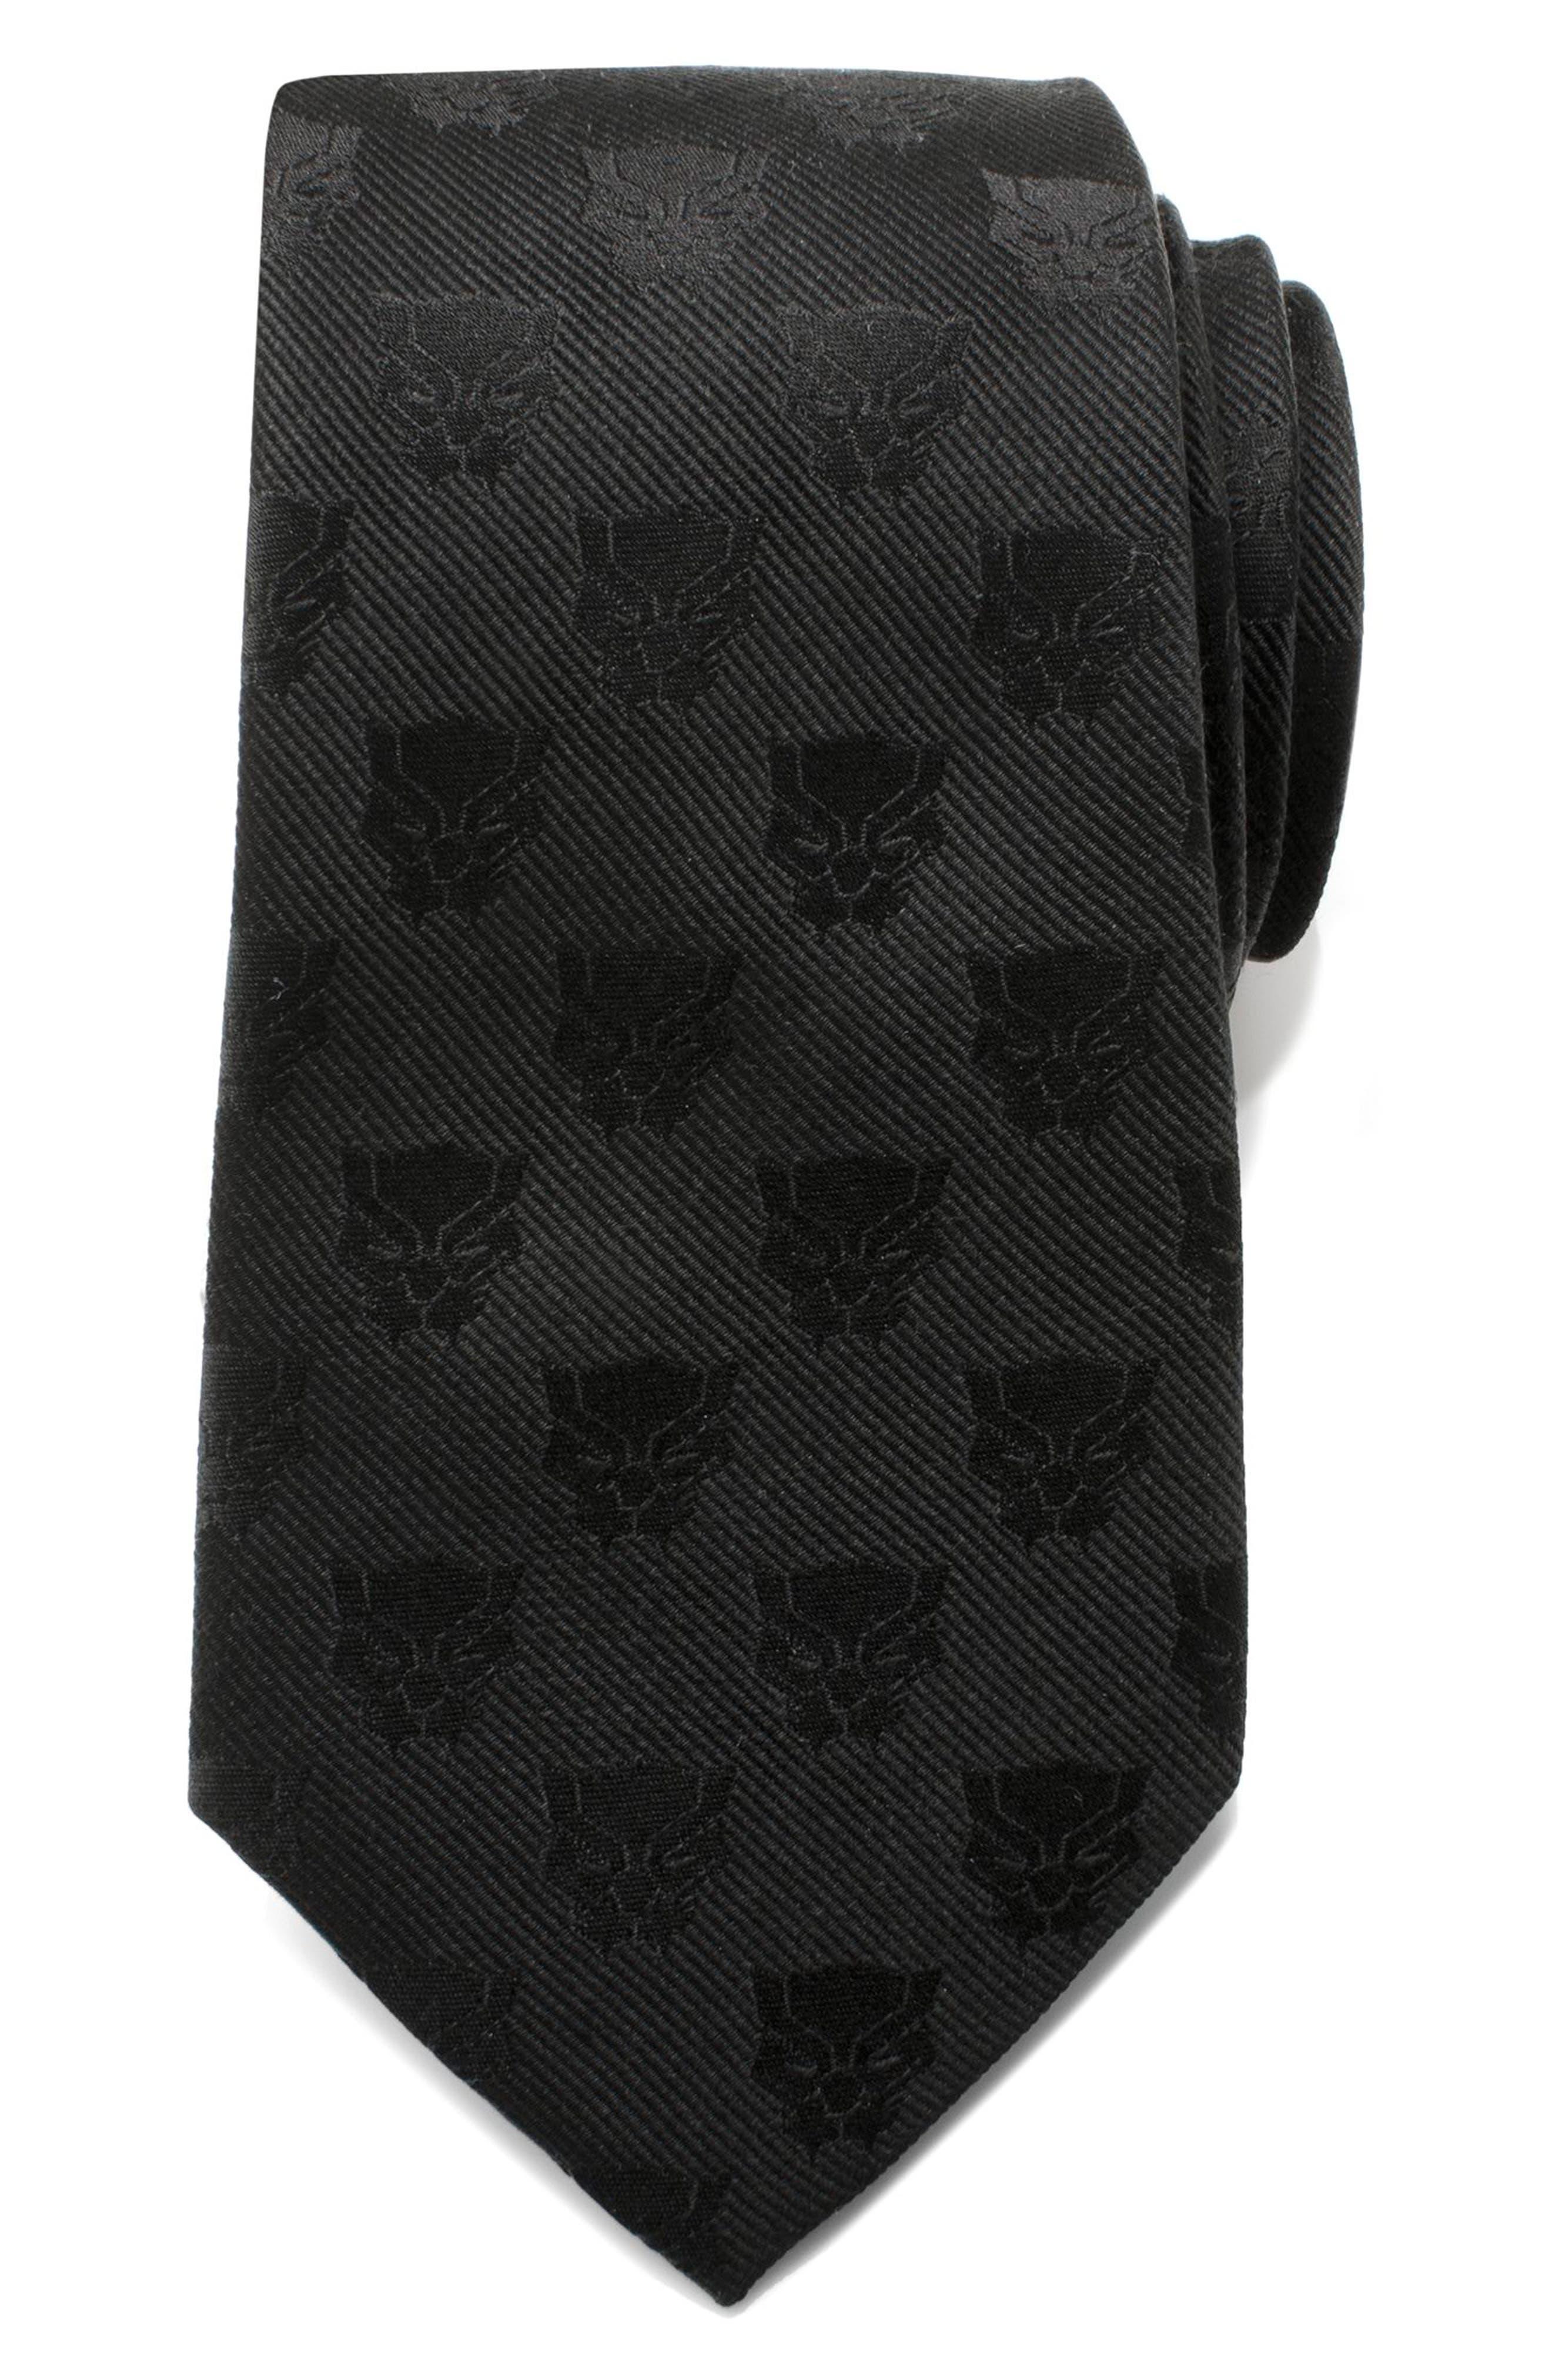 Black Panther Silk Tie,                         Main,                         color, Black